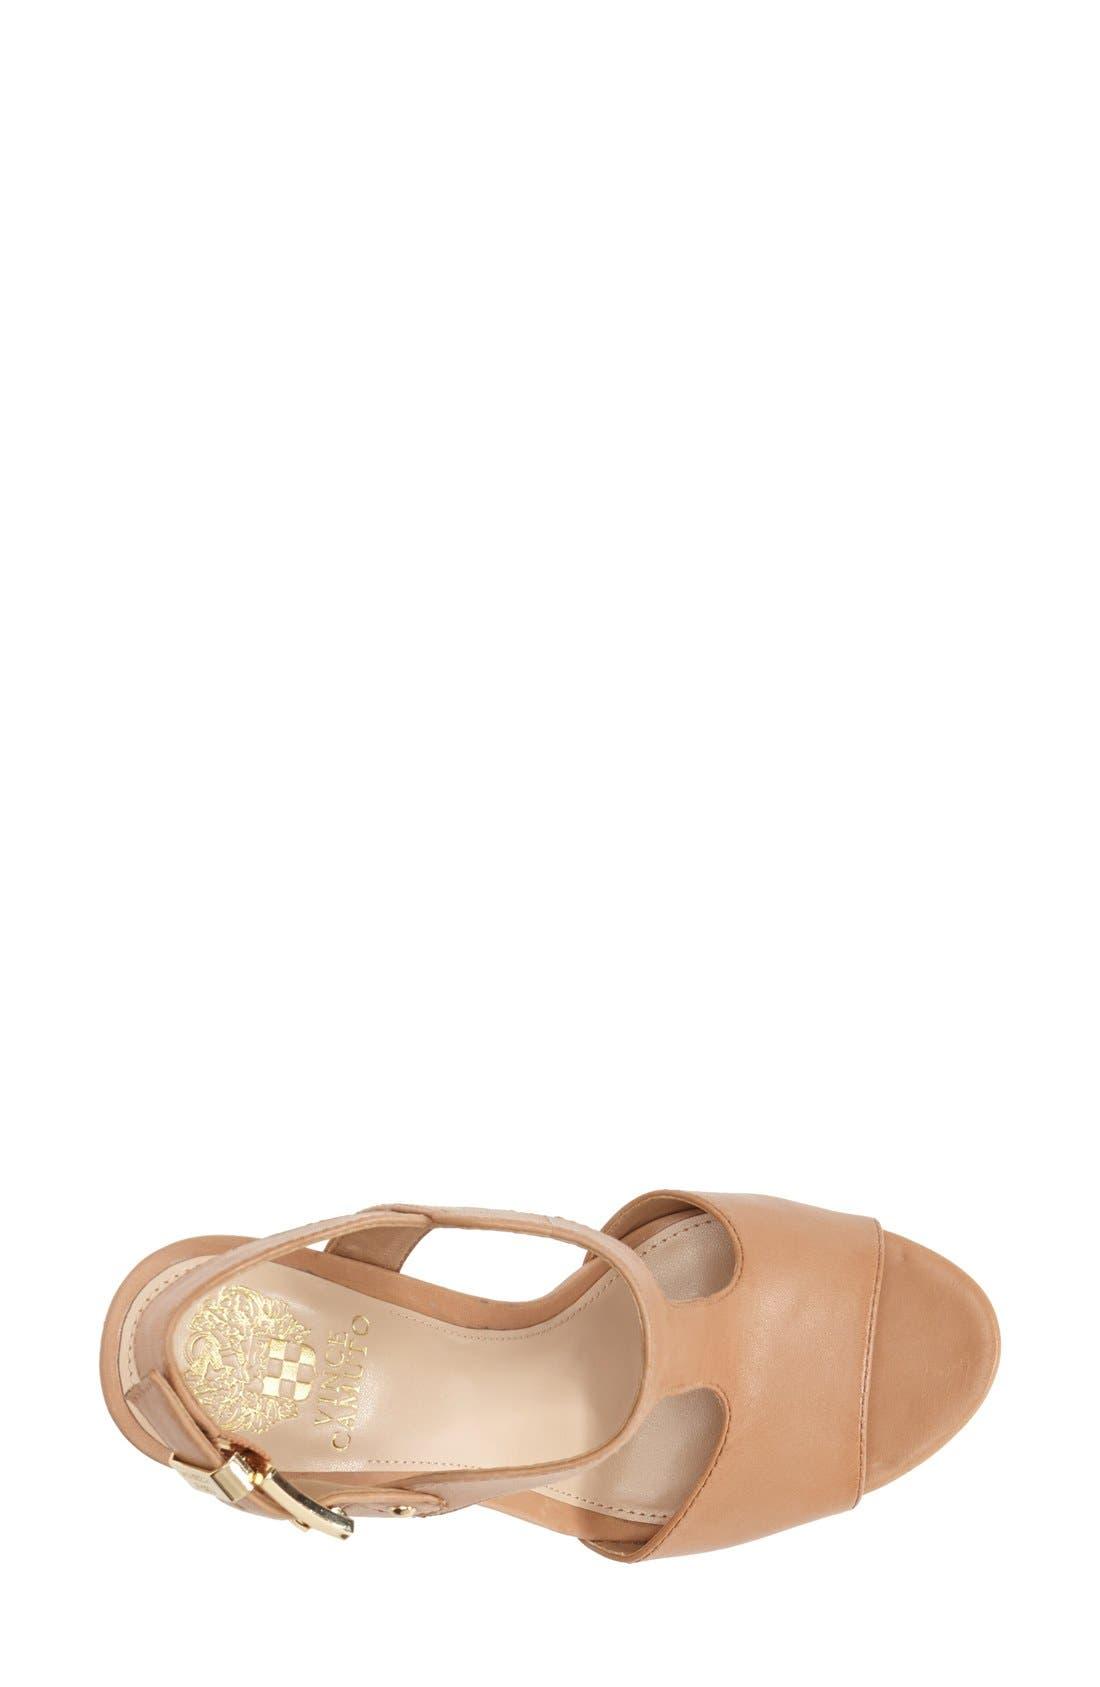 Alternate Image 3  - Vince Camuto 'Mathis' T-Strap Wedge Sandal (Women)